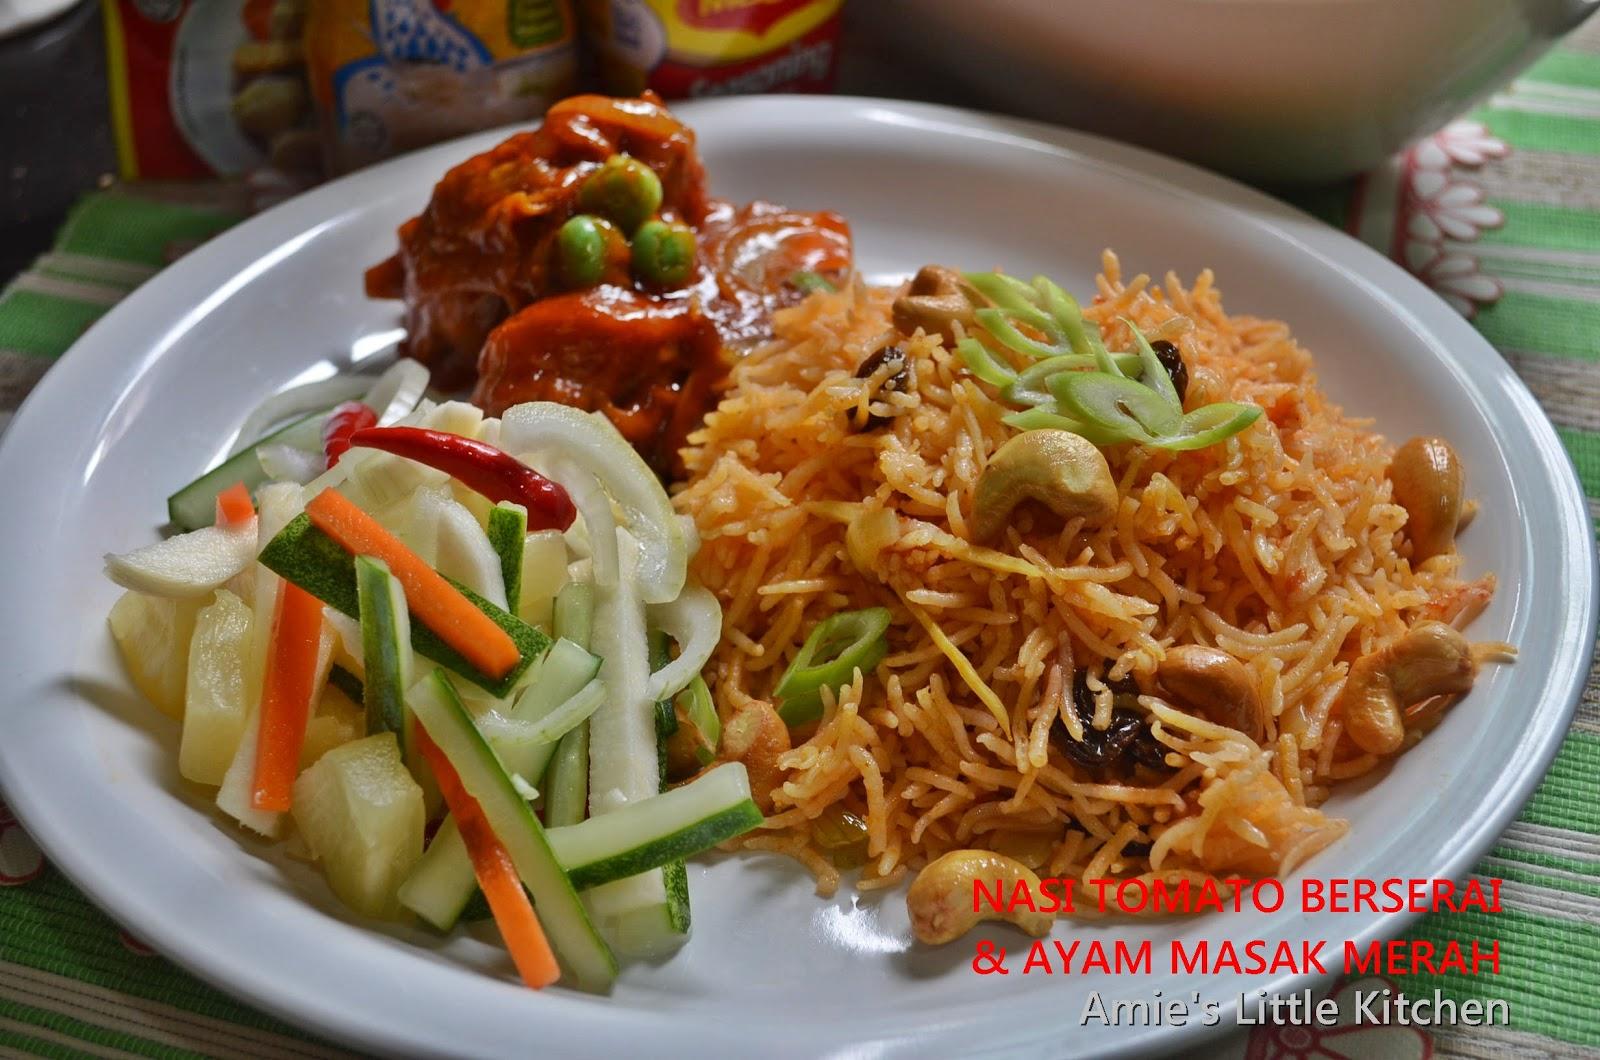 AMIE'S LITTLE KITCHEN: Nasi Tomato Berserai & Ayam Masak Merah